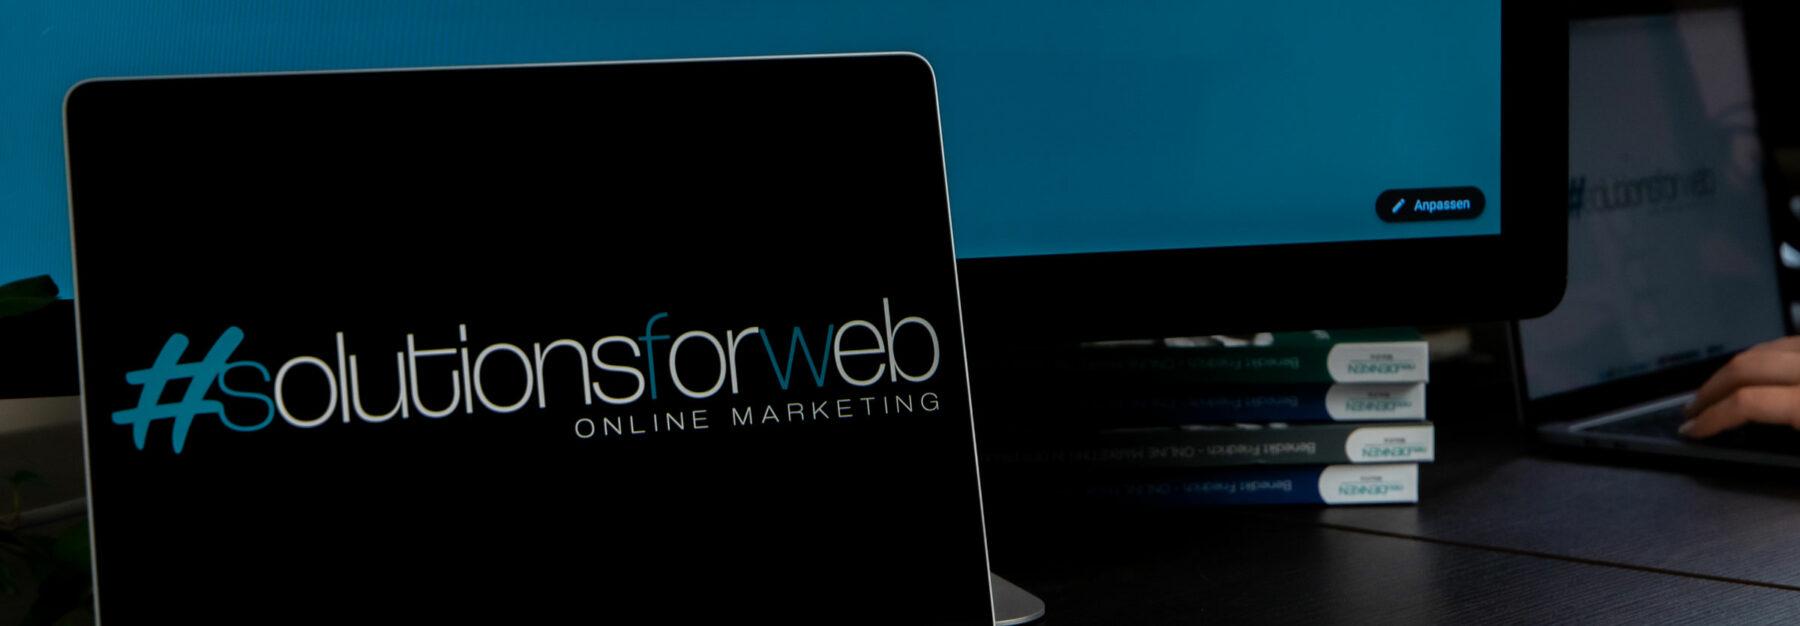 Leistungen-Header: Tablet-Ansicht Logo Solutions for web